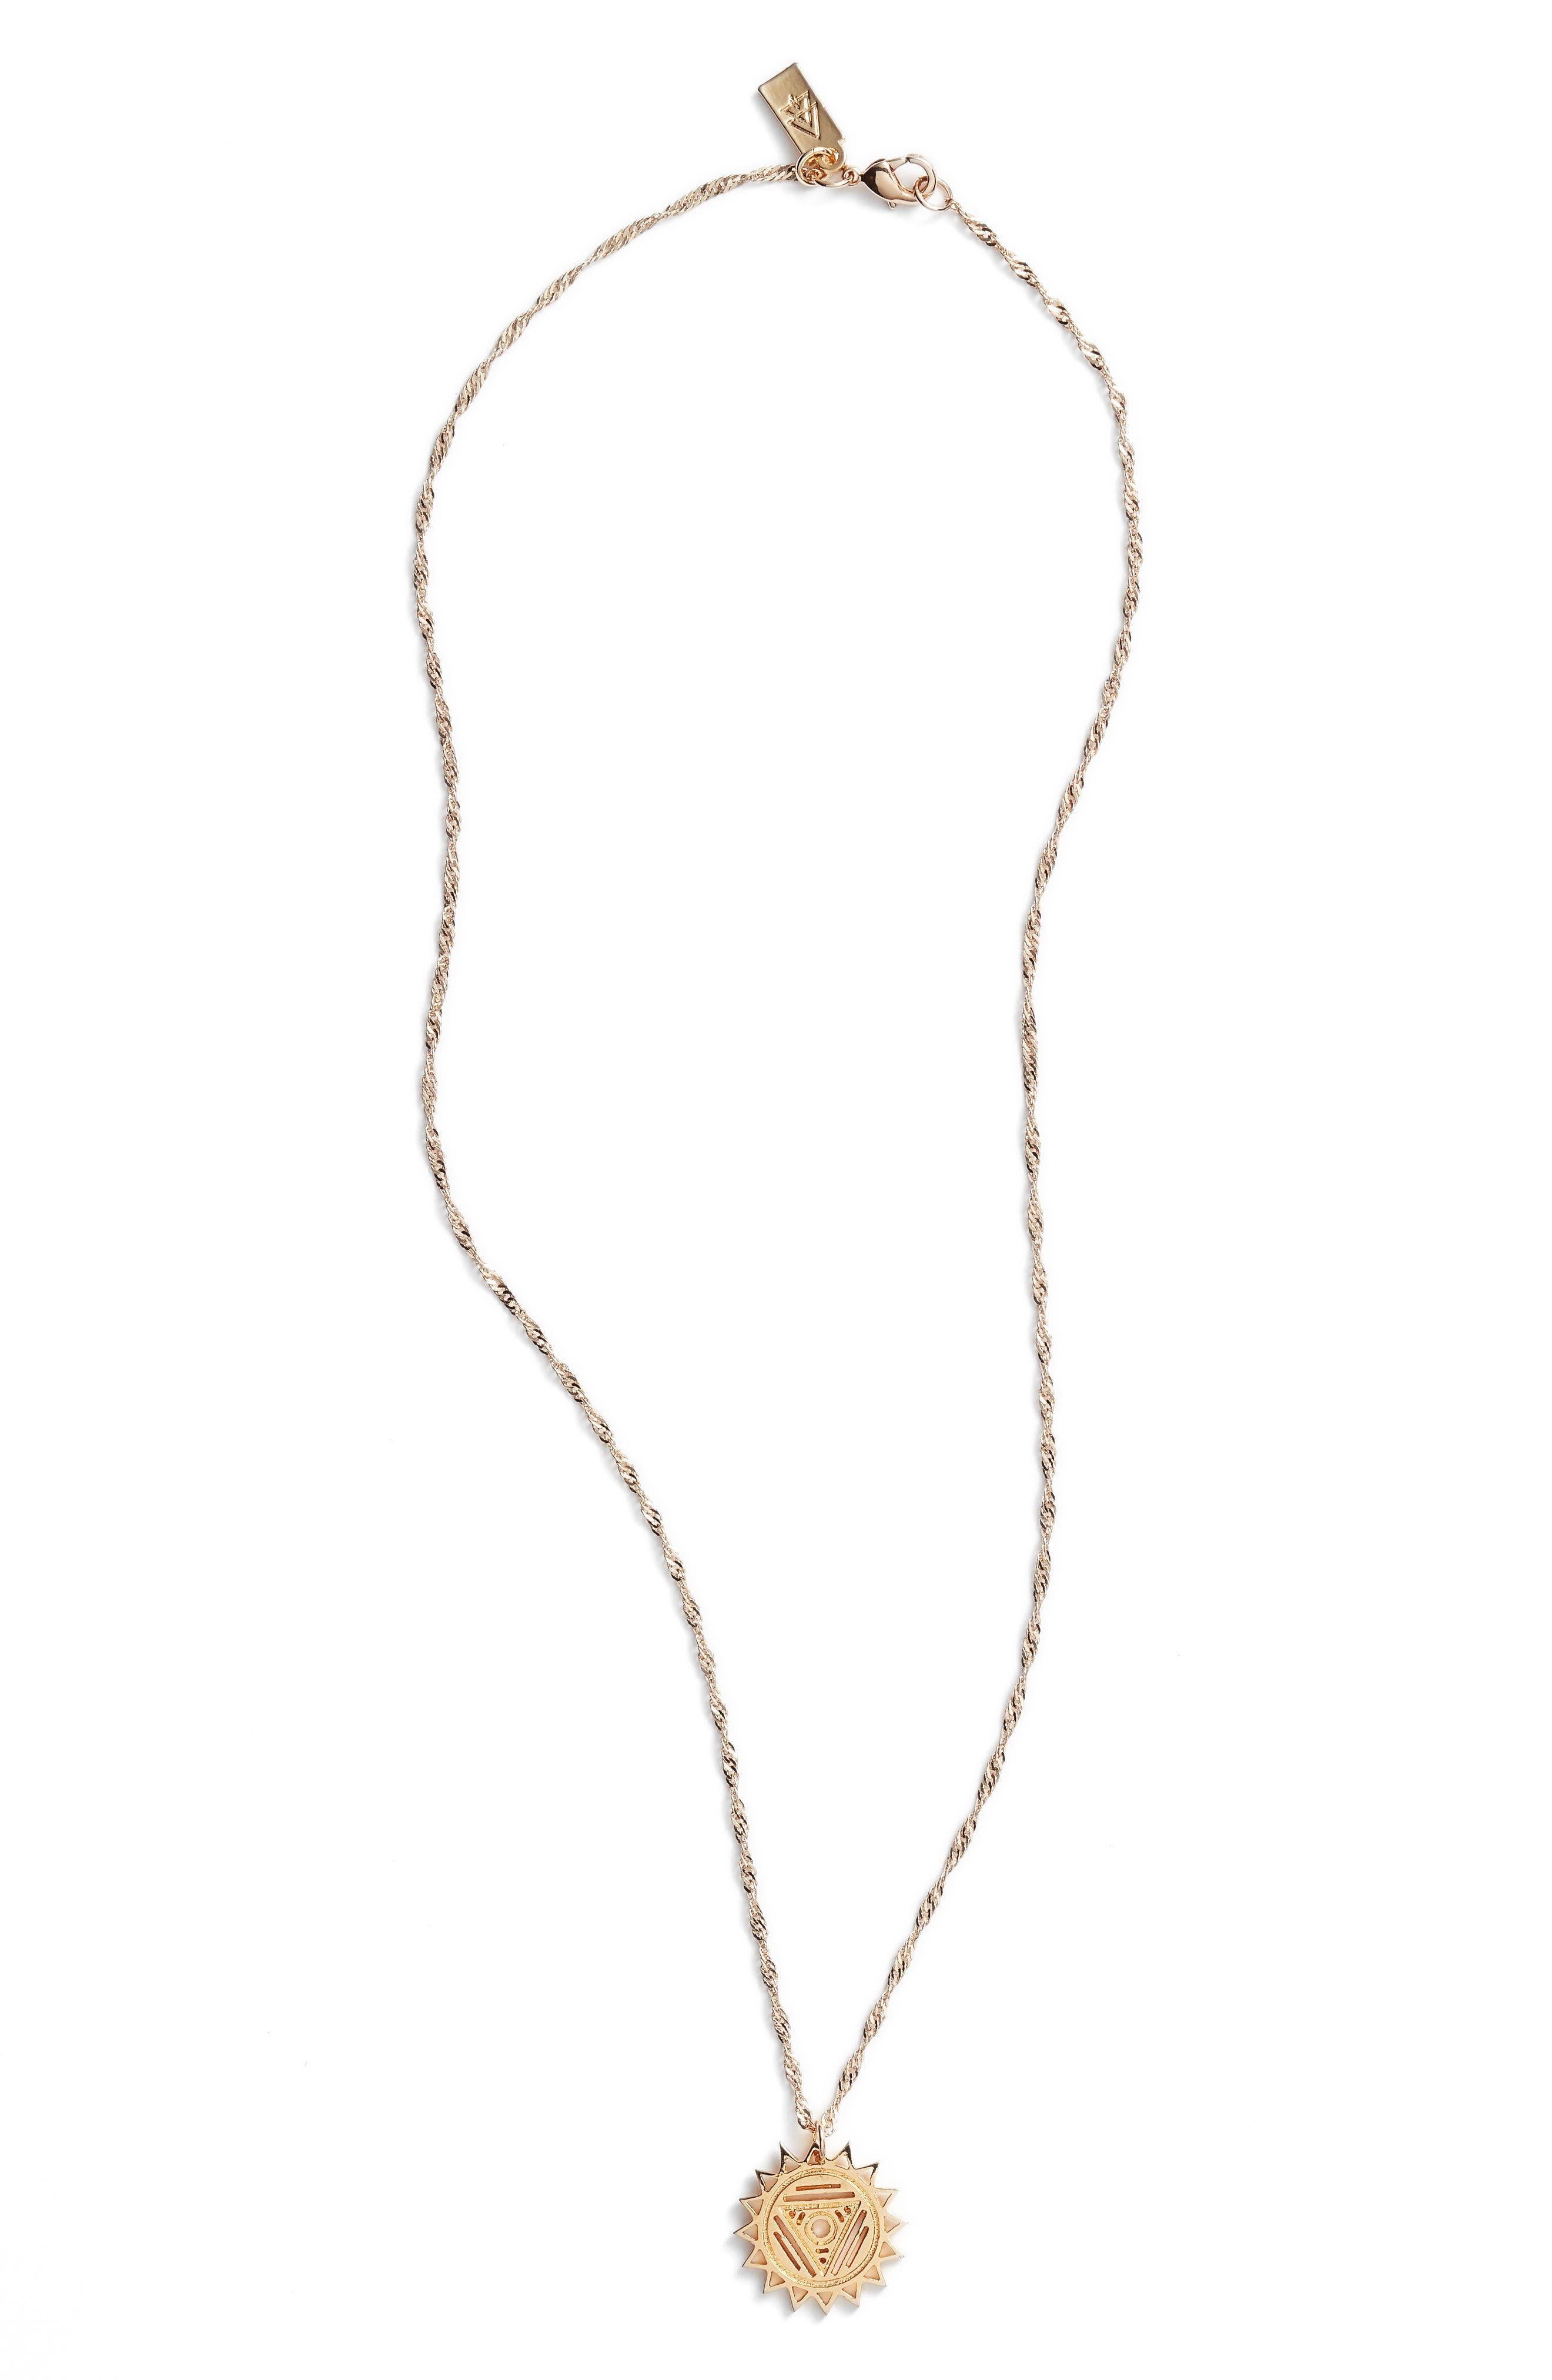 CAM Chakra Pendant Necklace